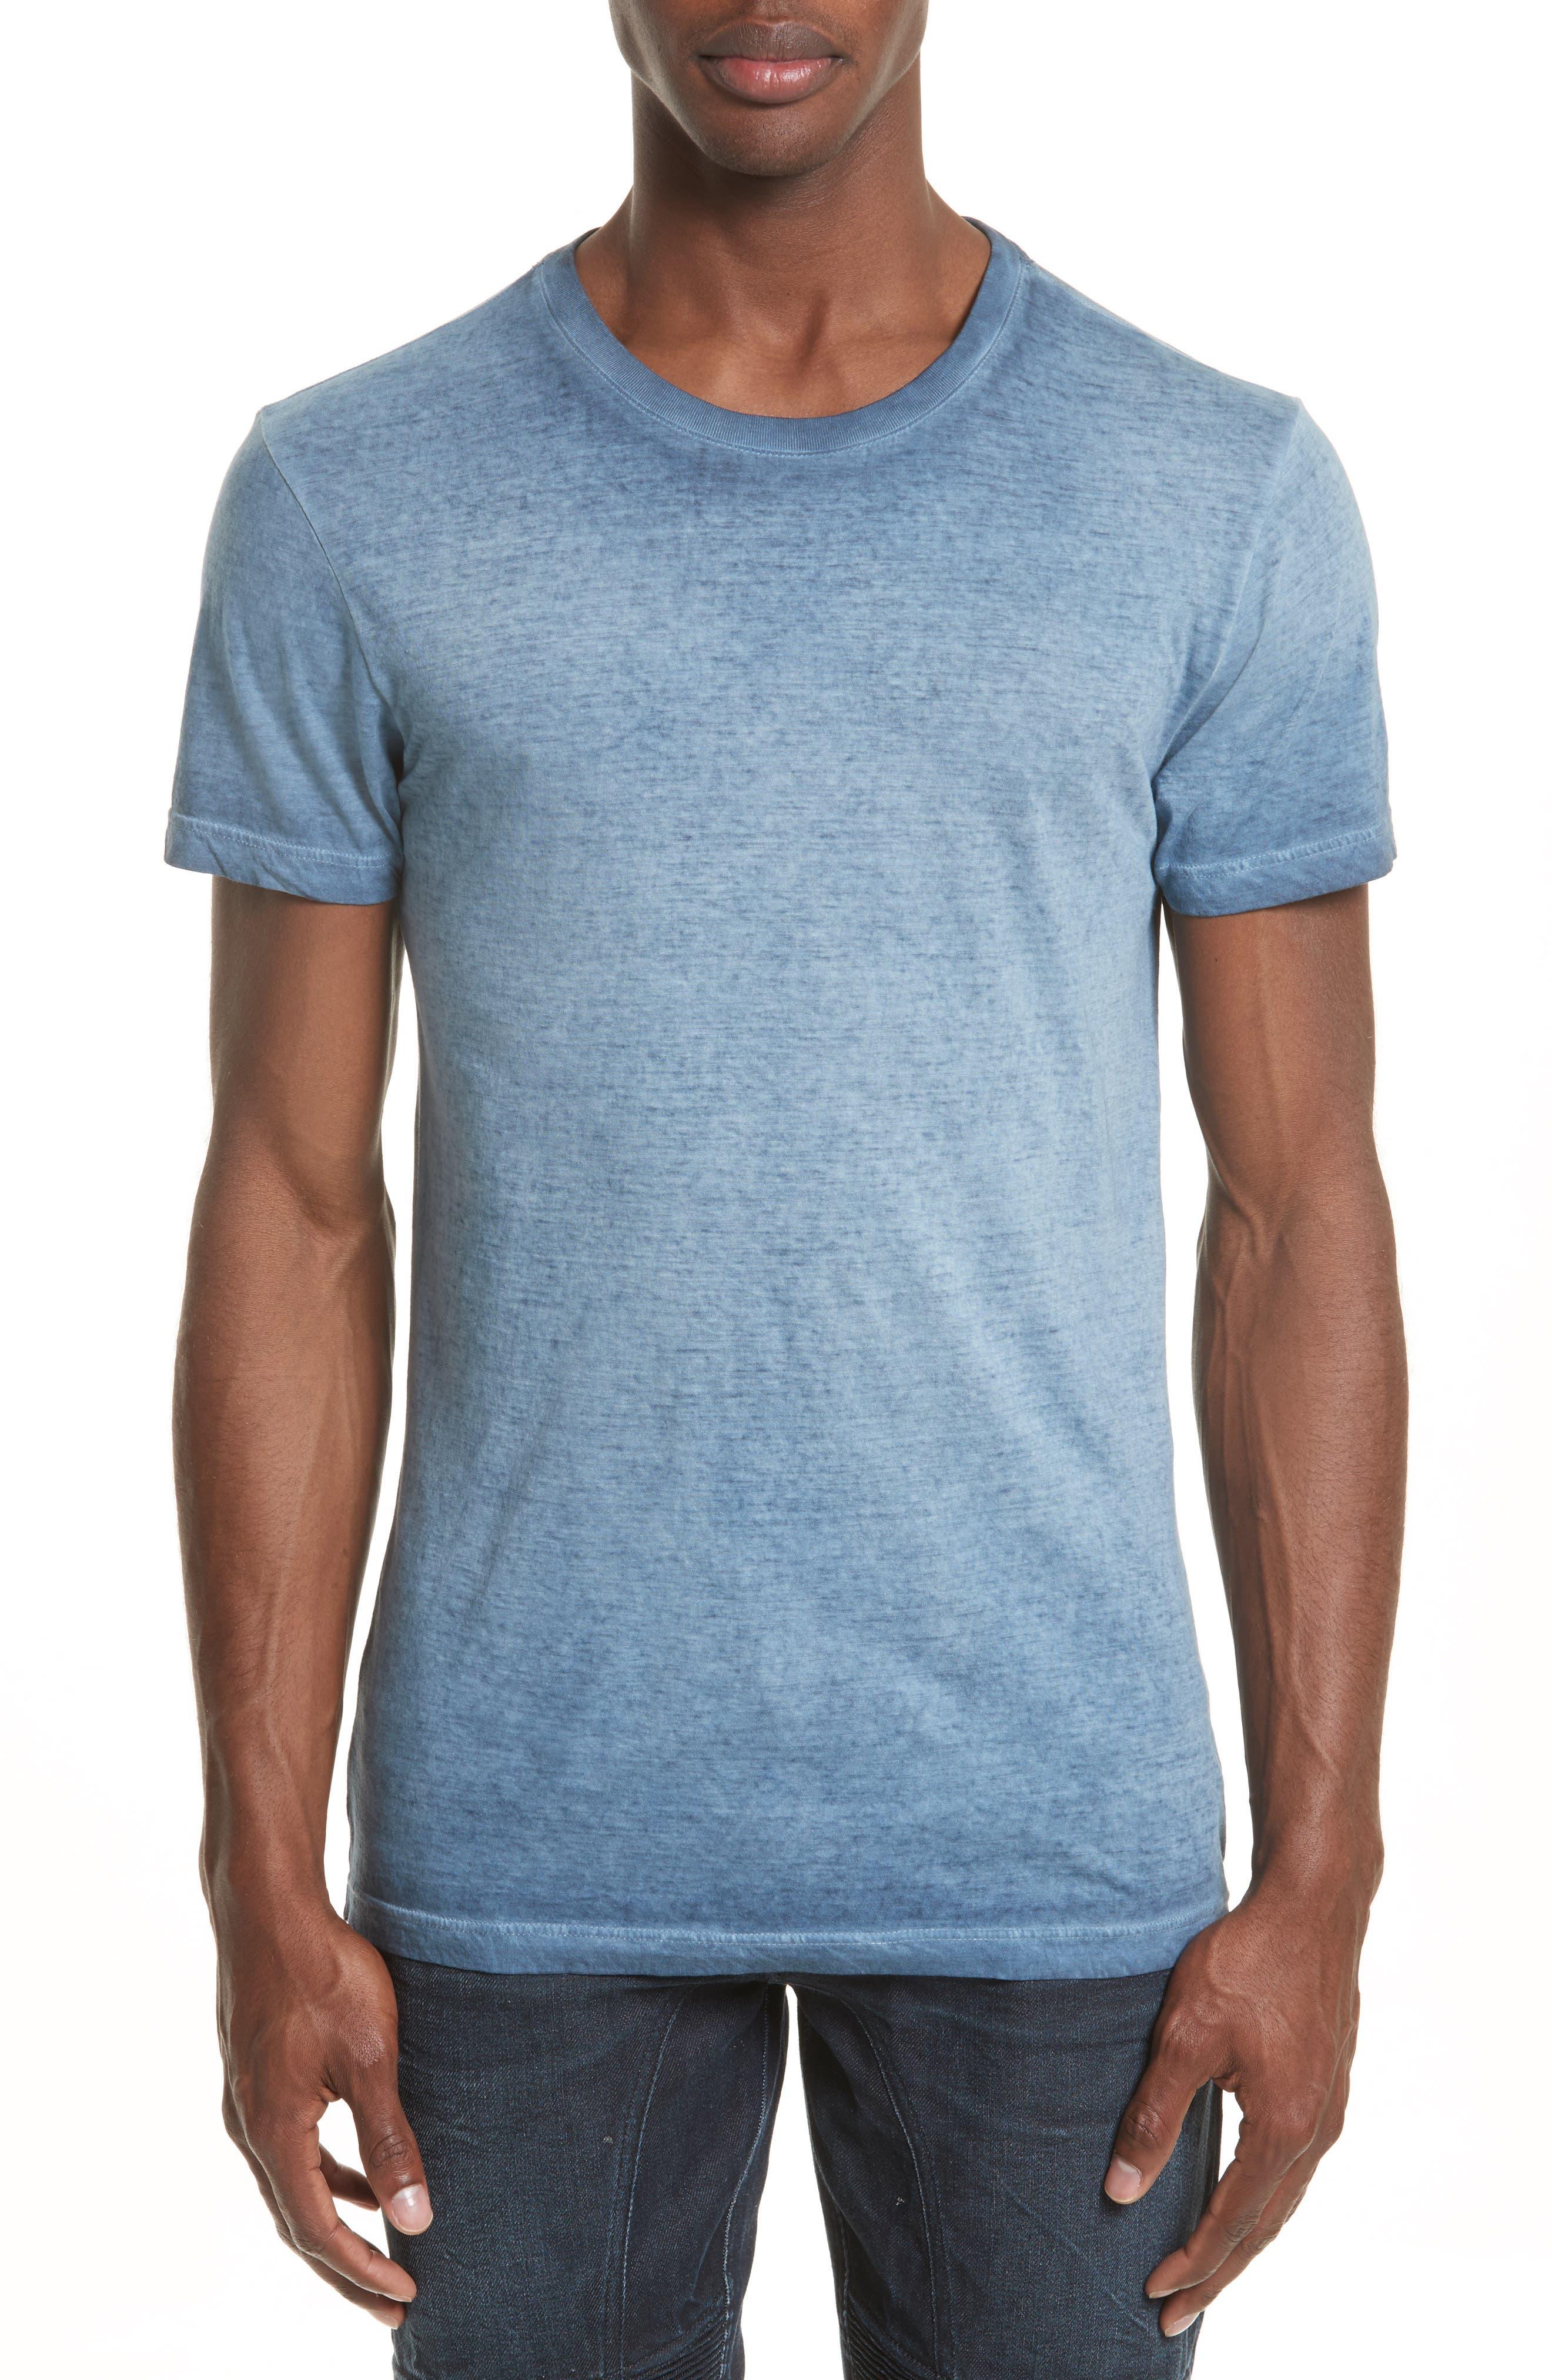 Alternate Image 1 Selected - Belstaff 'Trafford' Cotton Crewneck T-Shirt